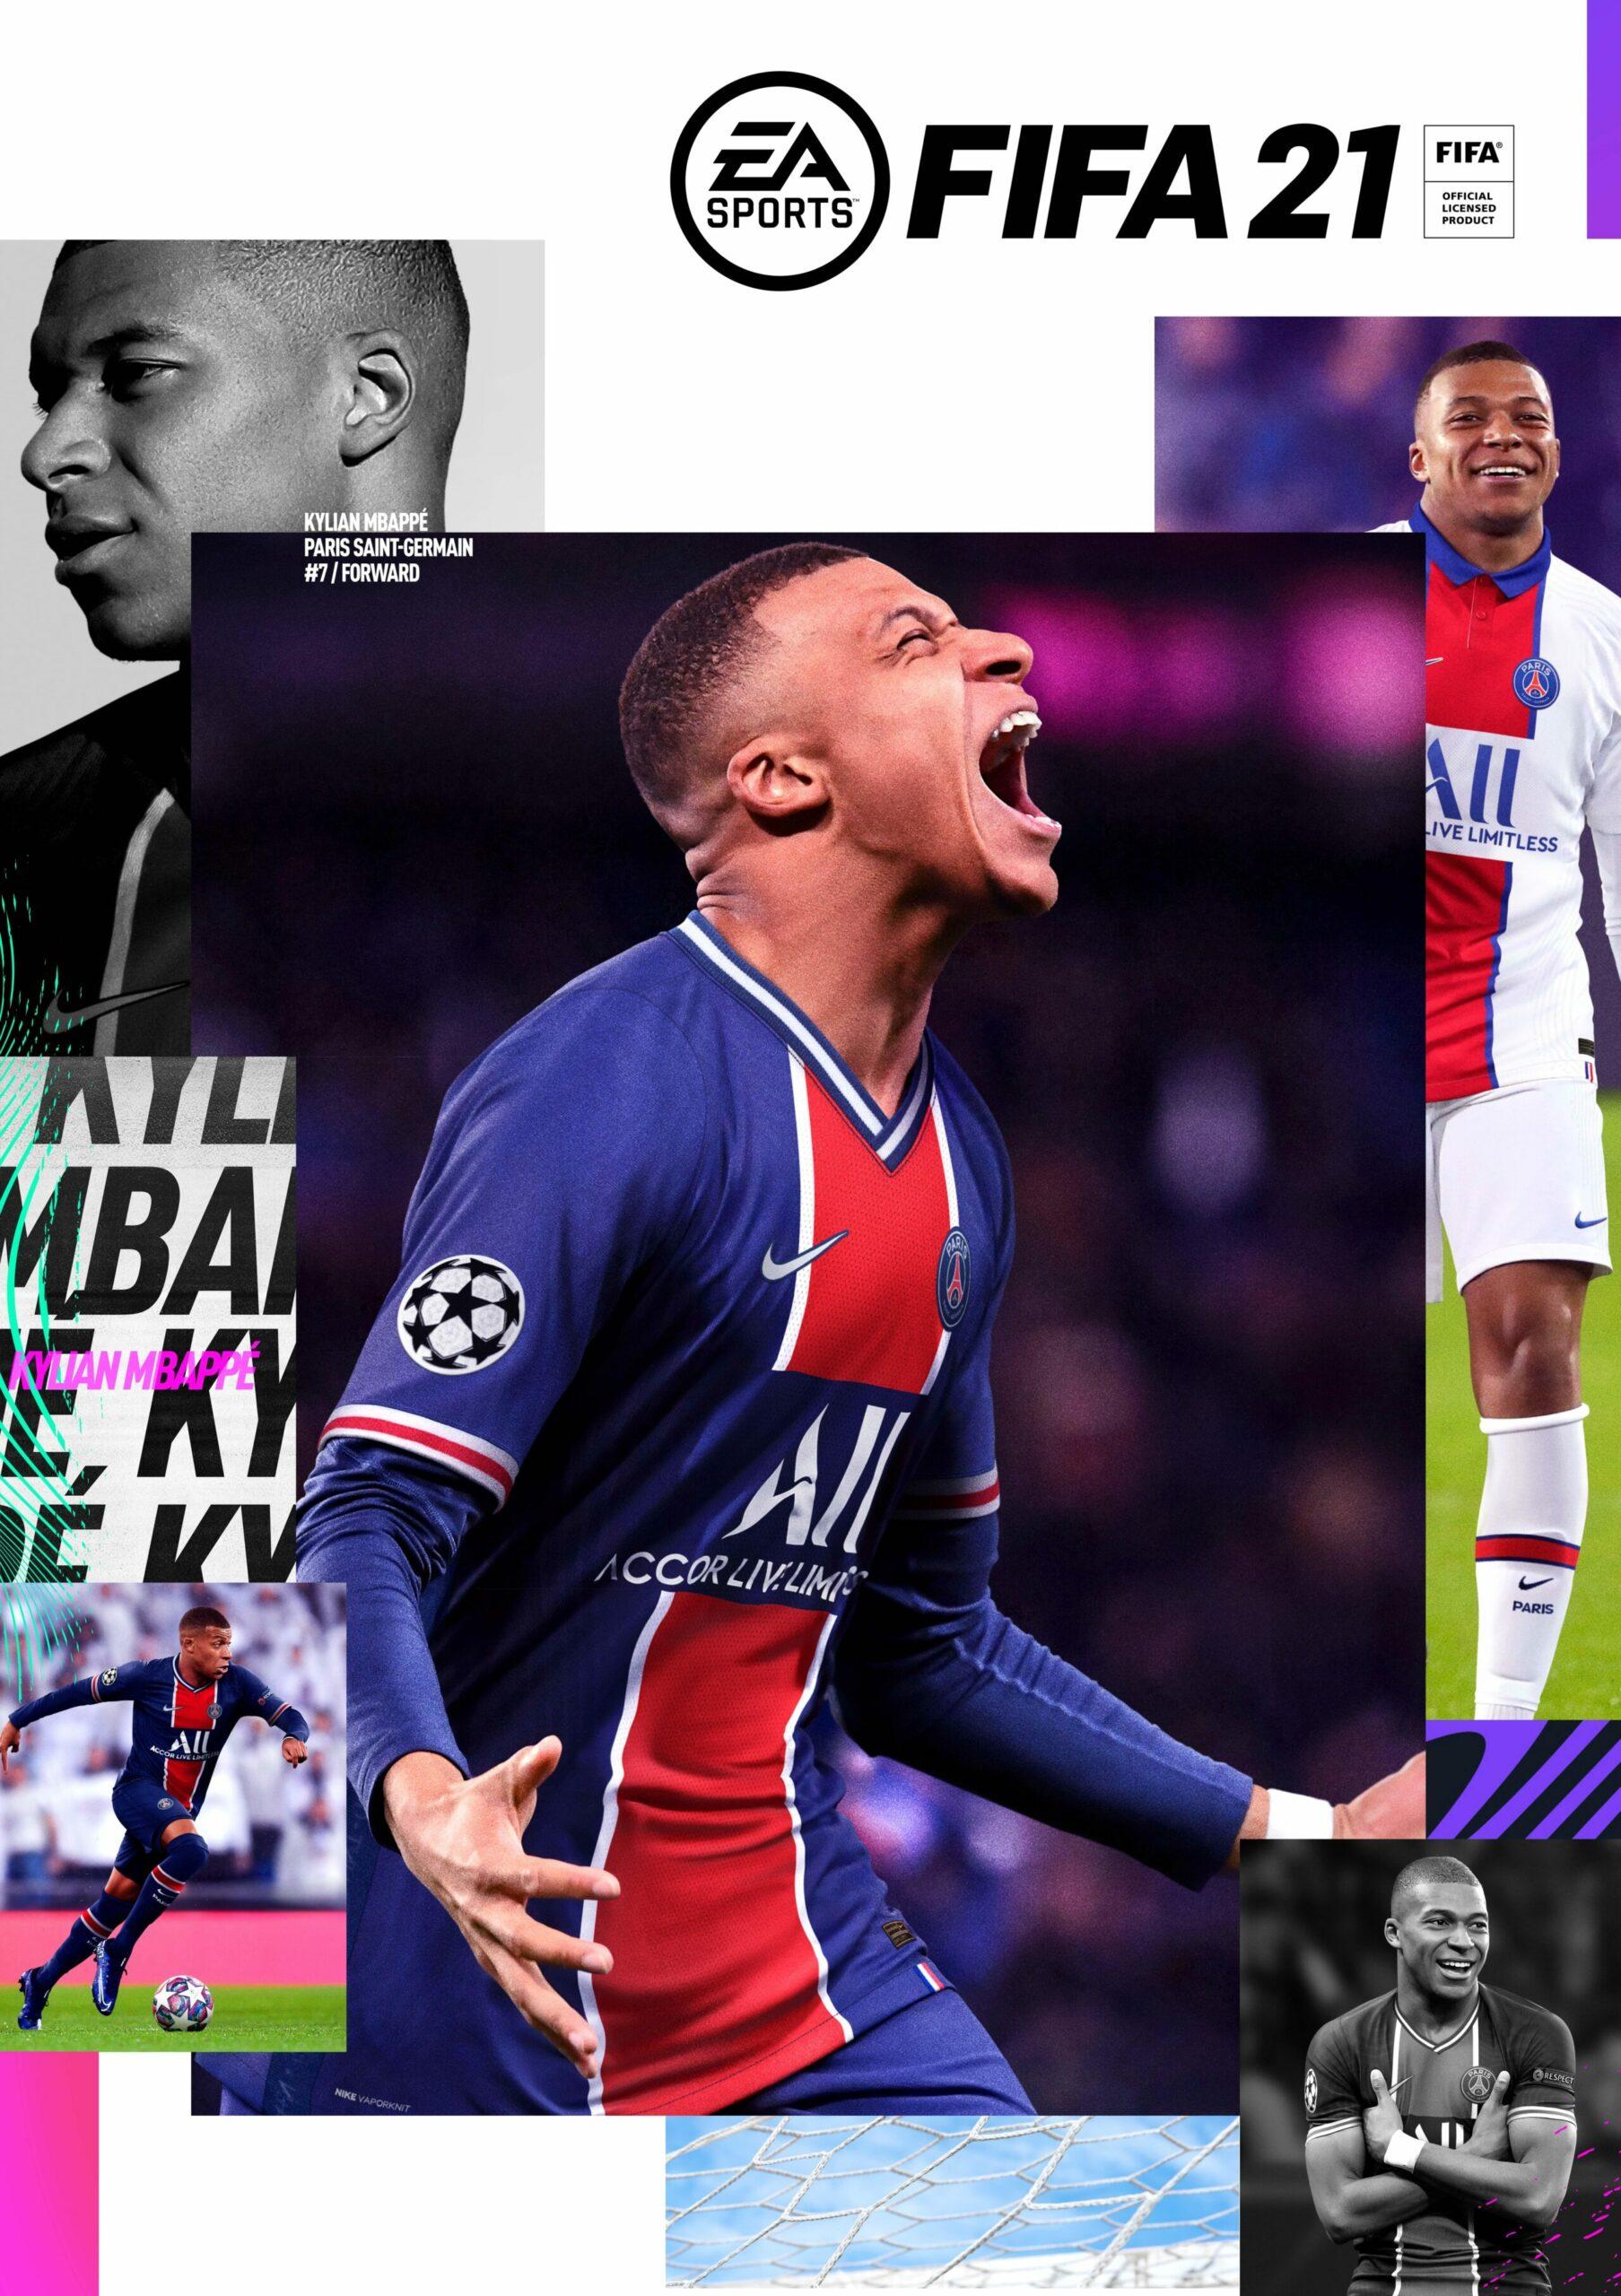 EA SPORTS FIFA 21 Is Bringing Some Big Updates